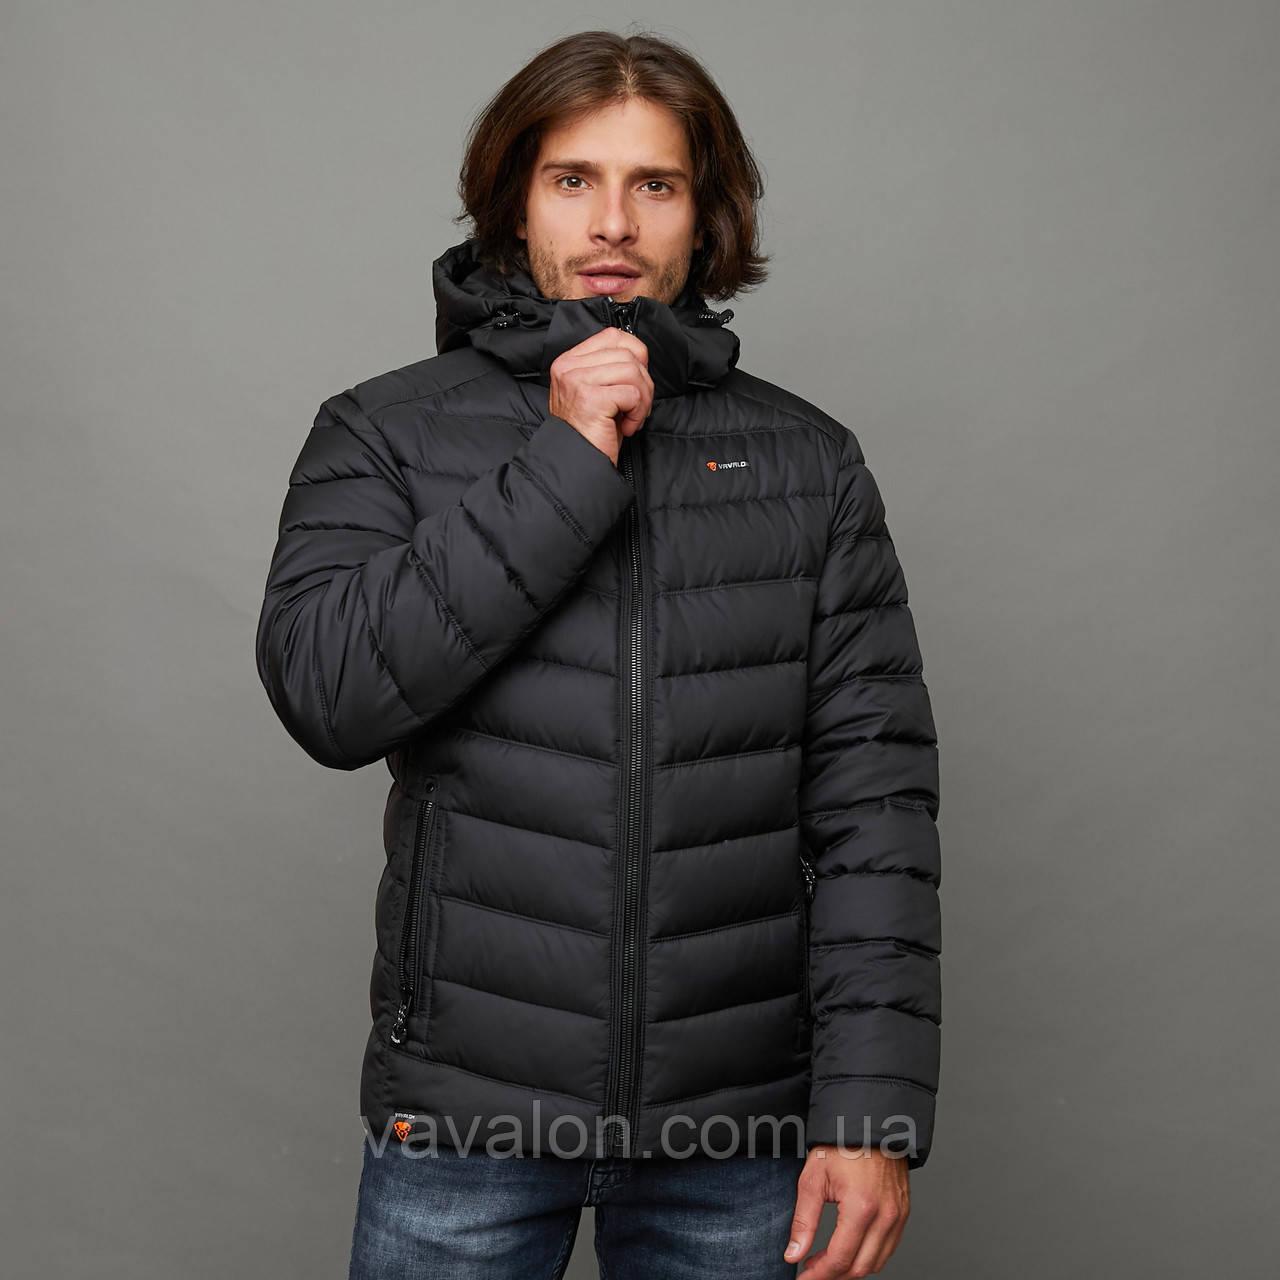 Куртка демисезонная Vavalon EZ-932 Black